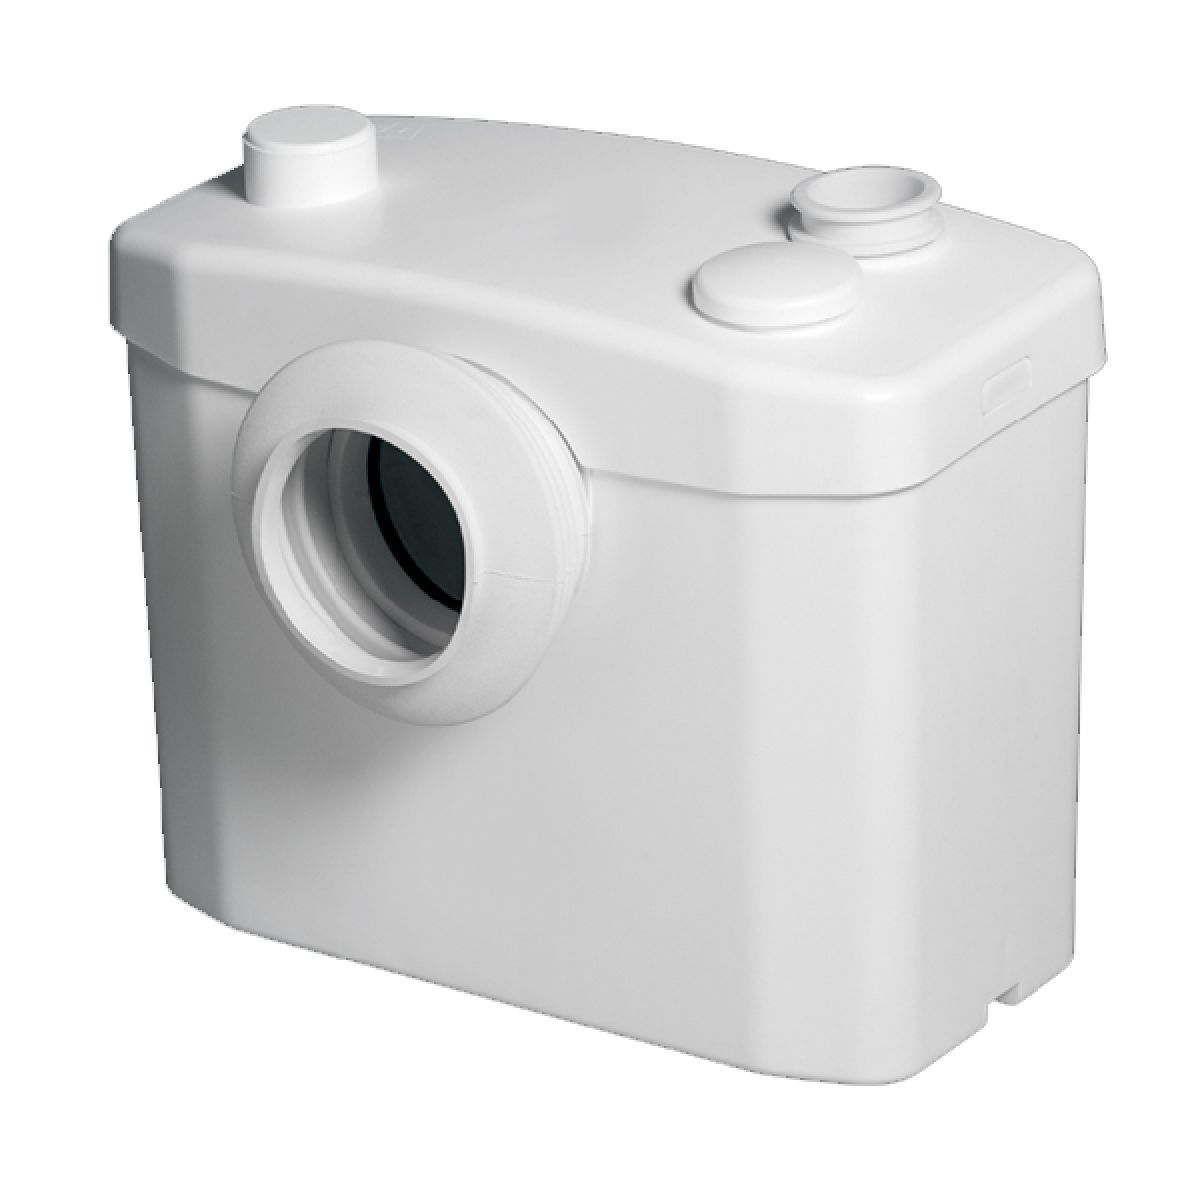 Sanitop Small Bore Macerator